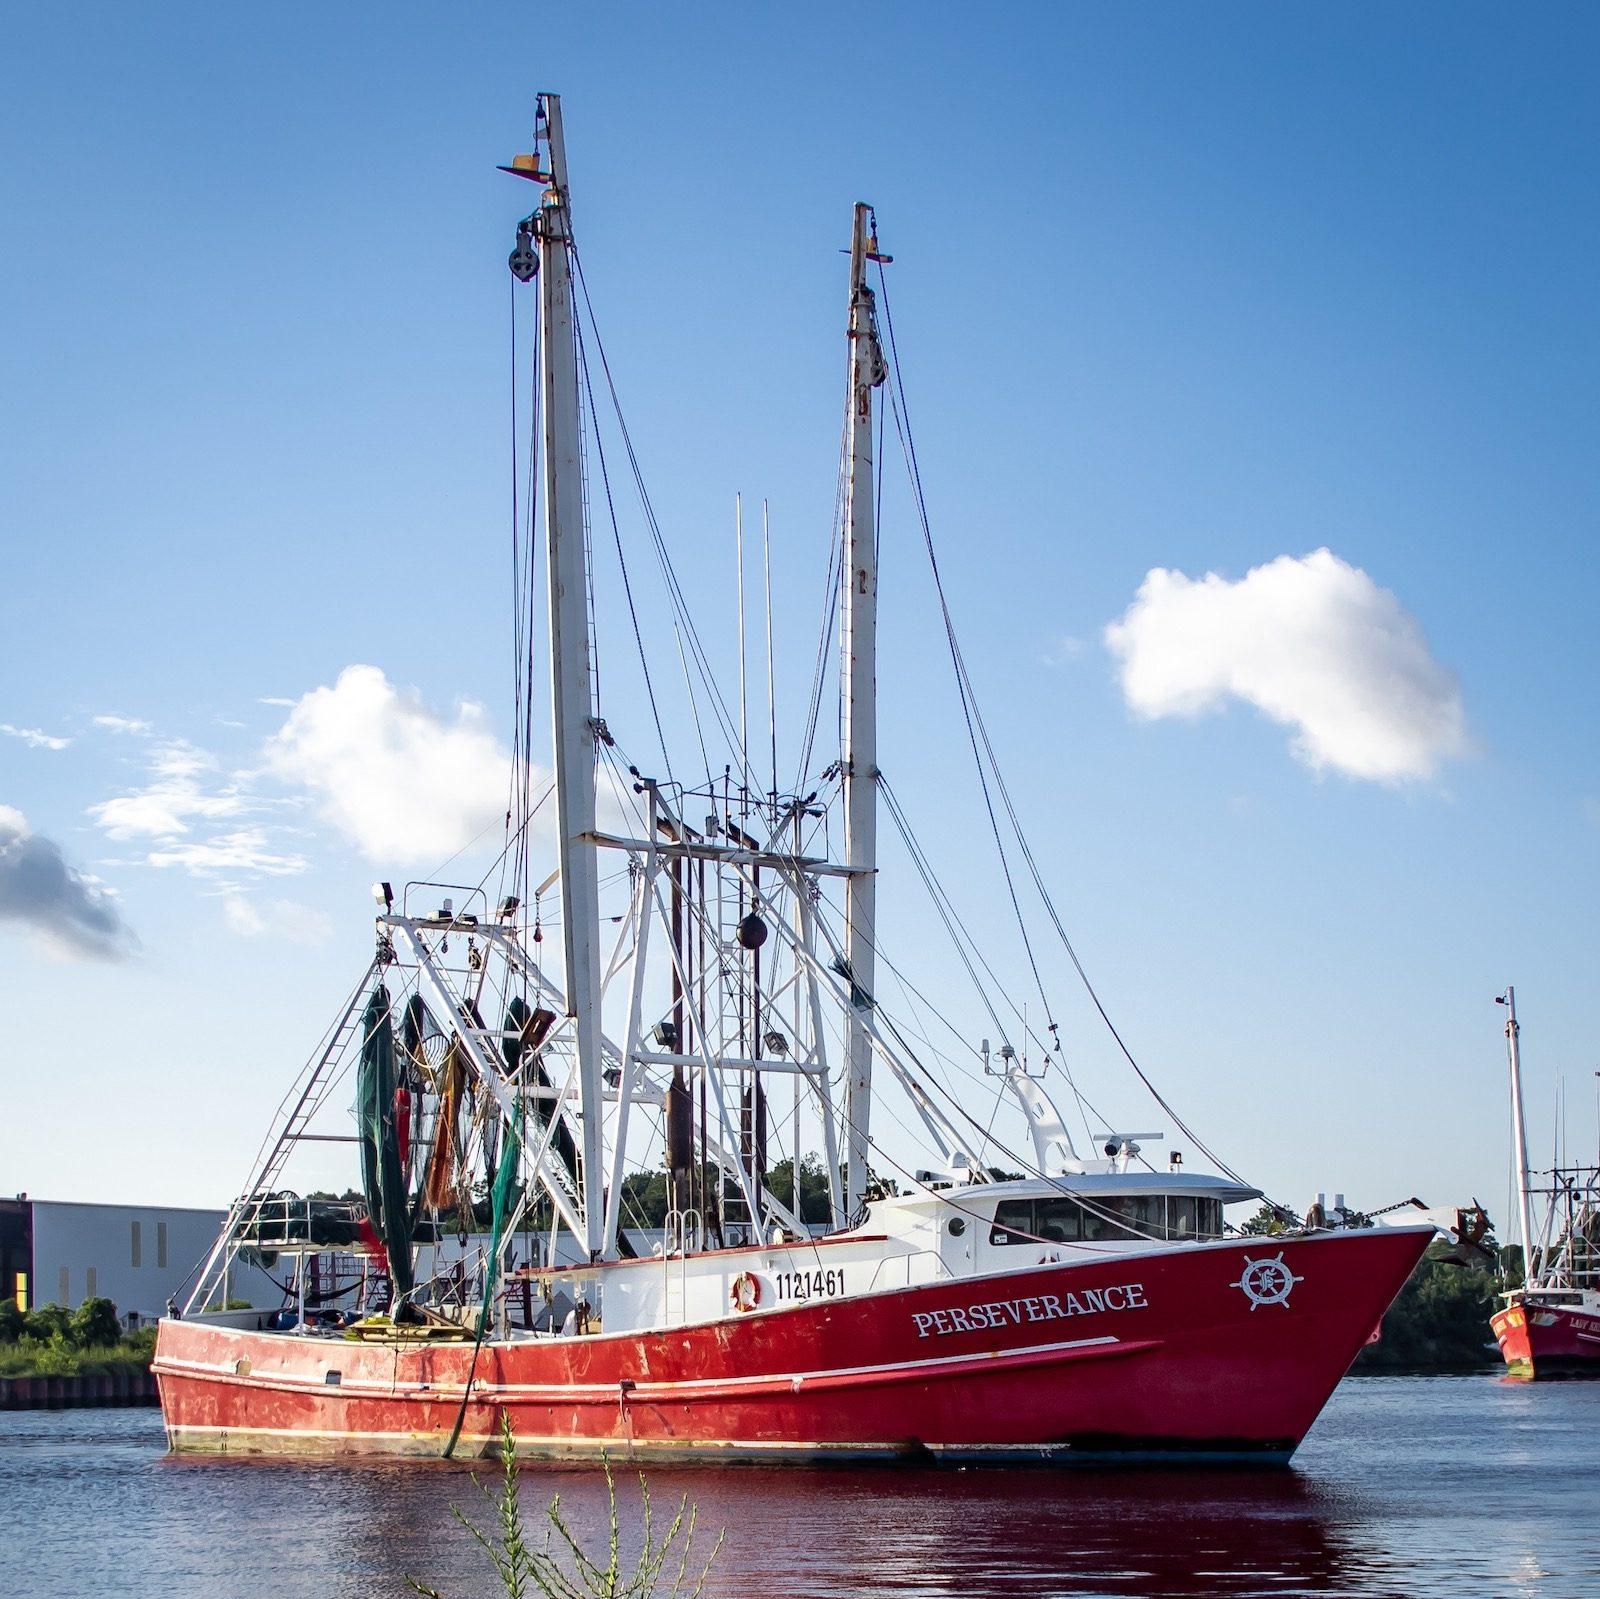 Shrimp boat coming into port in Bayou La Batre, AL